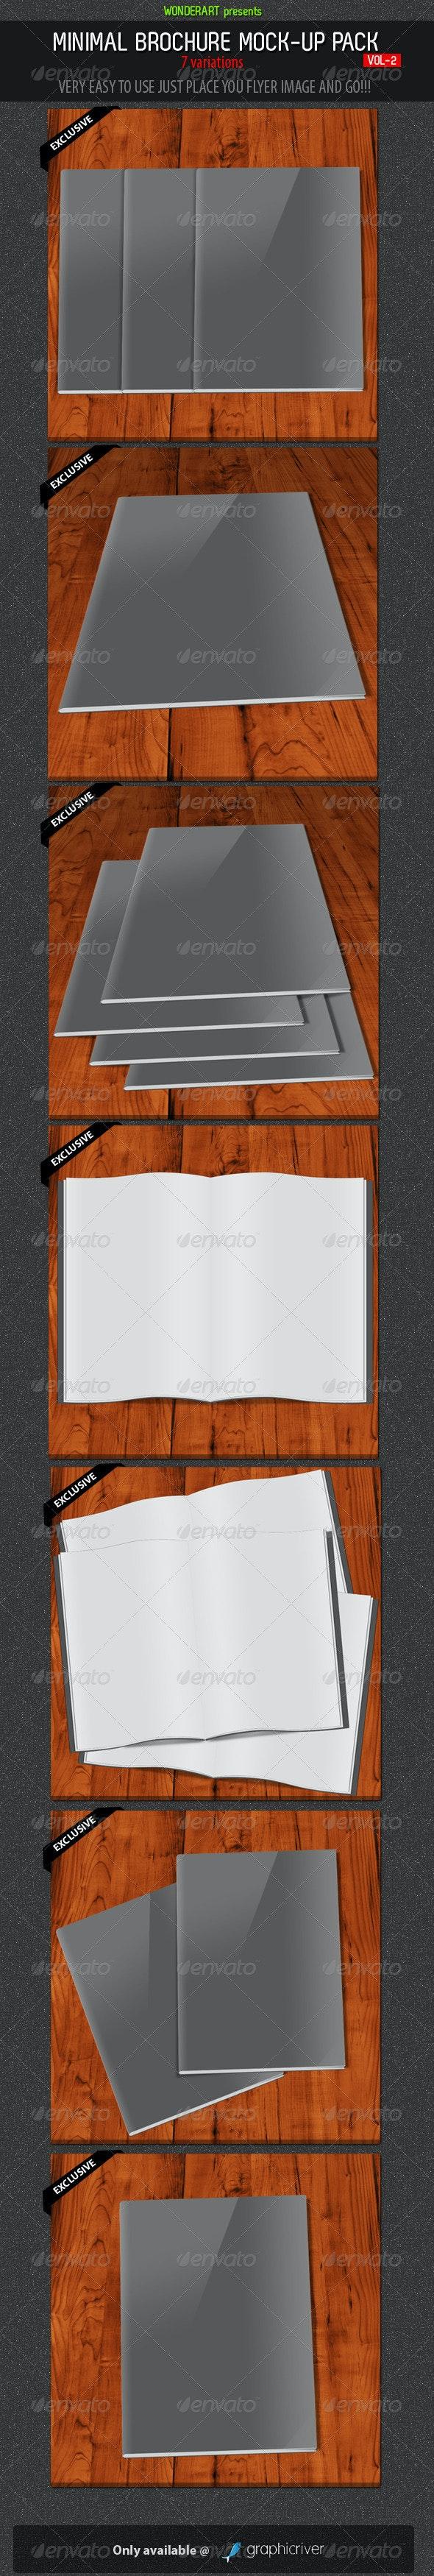 Minimal Brochures Mock-up Pack - 2 - Brochures Print